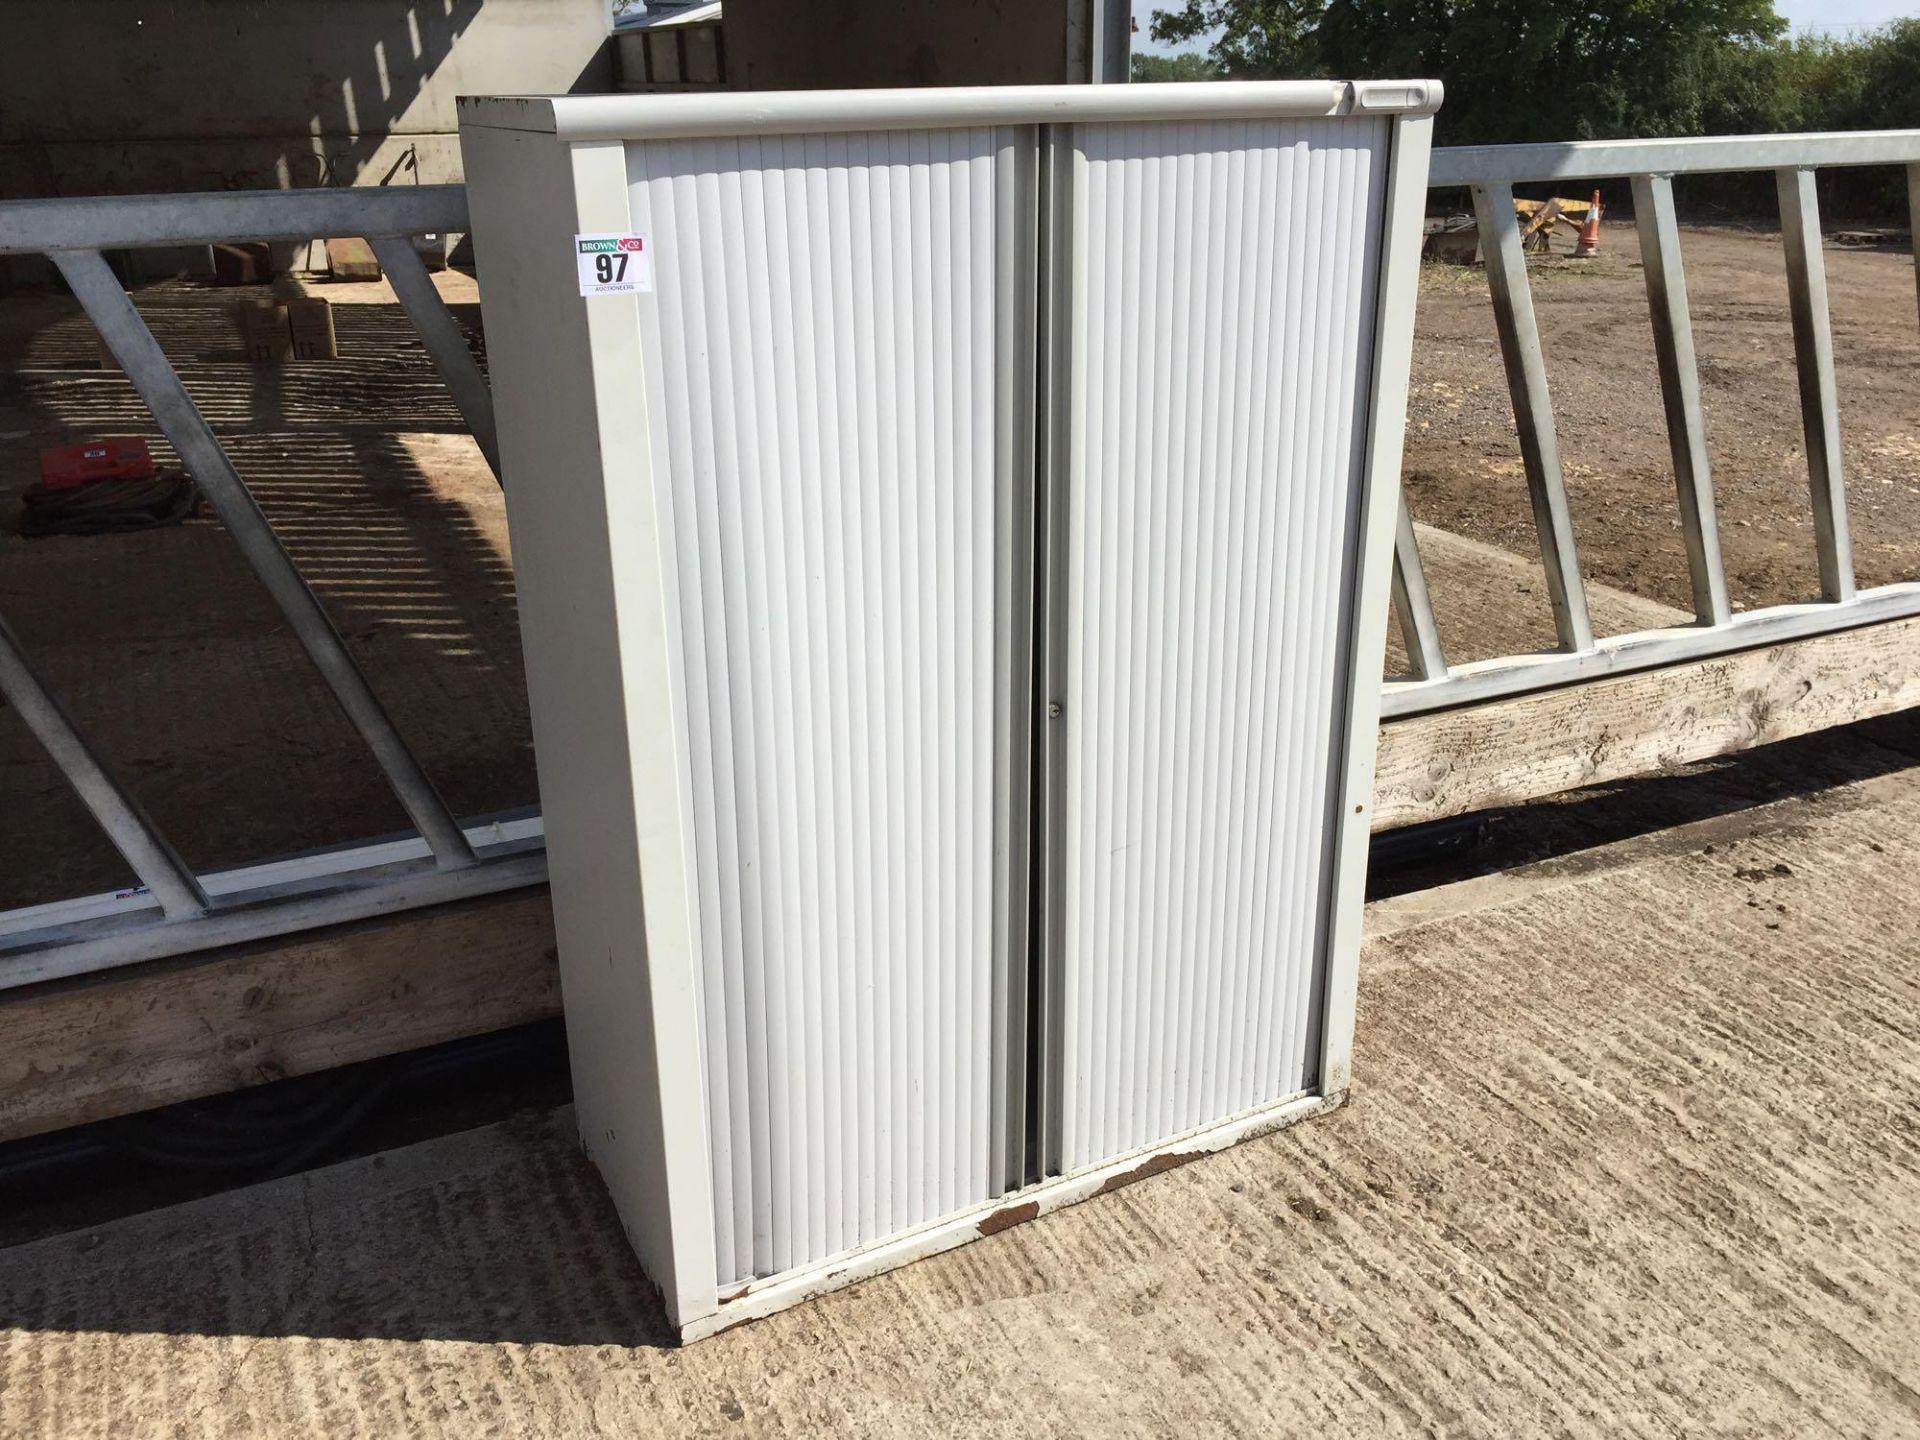 Lot 97 - Storage cabinet